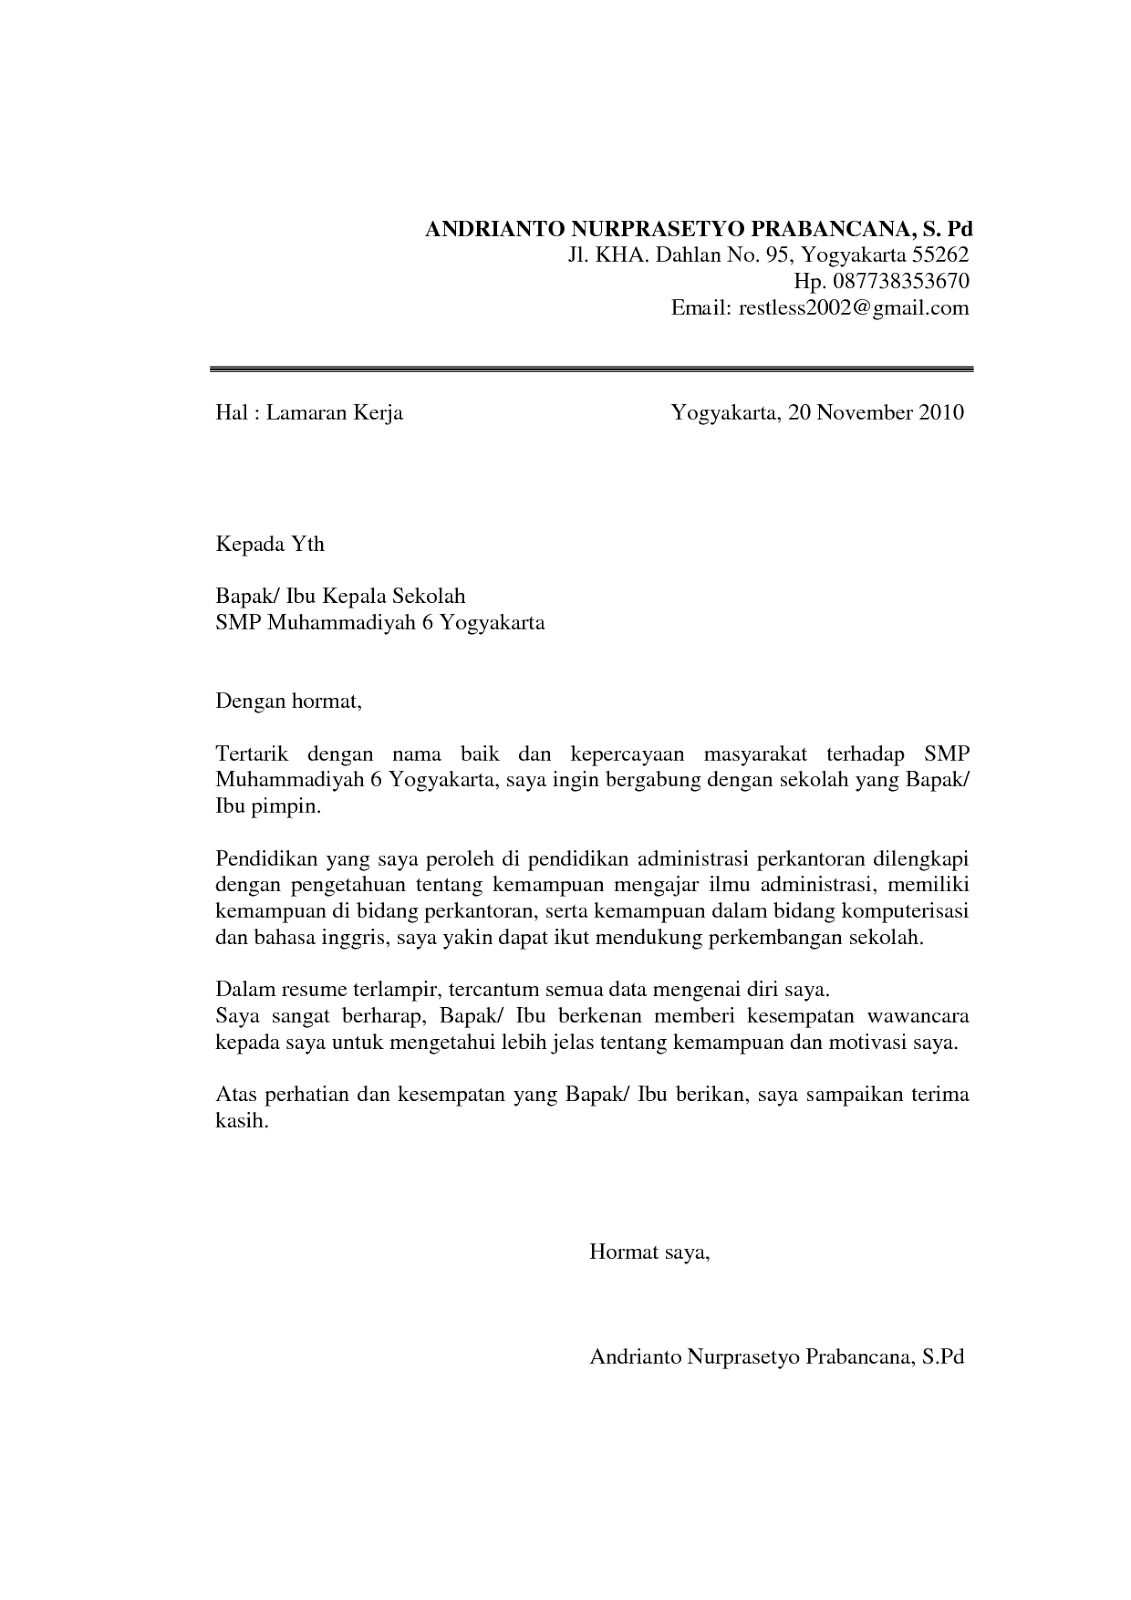 Job Application Sample Letter In Urdu